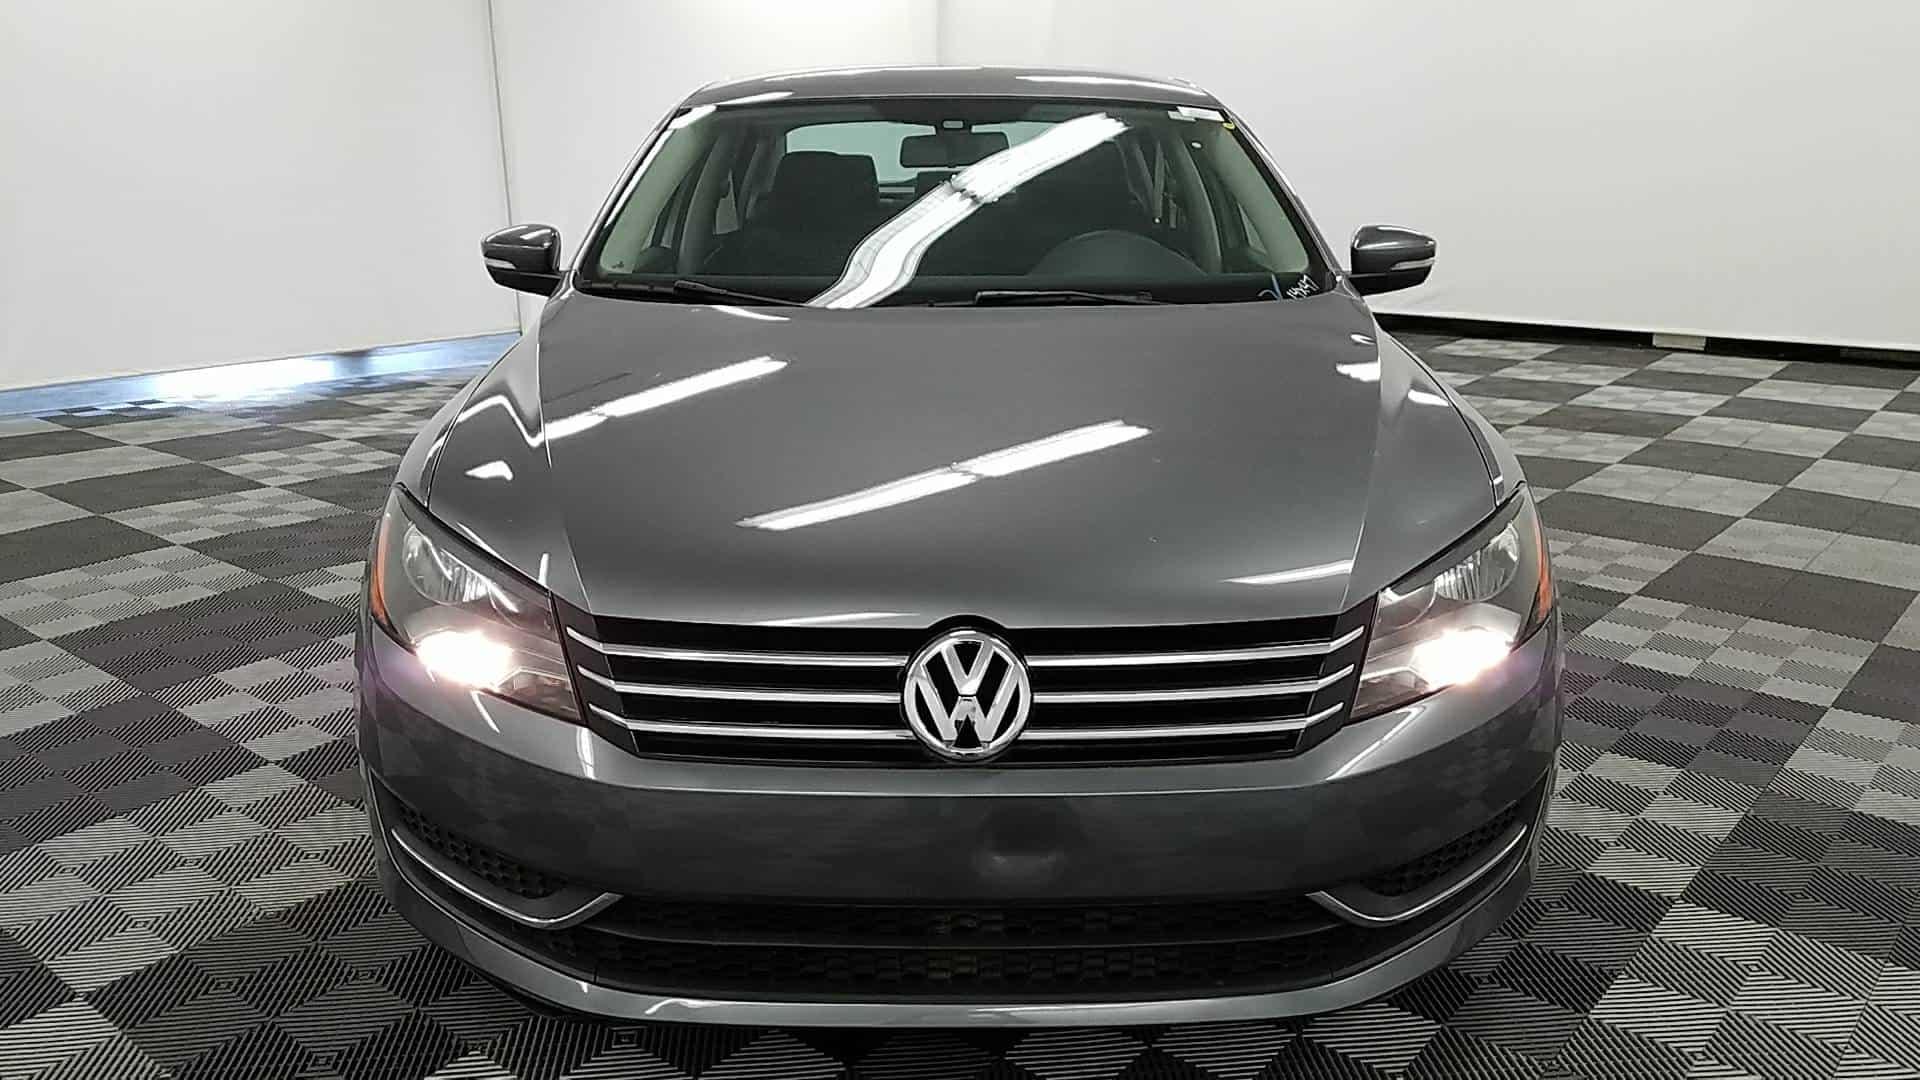 2014 VW Passat.2